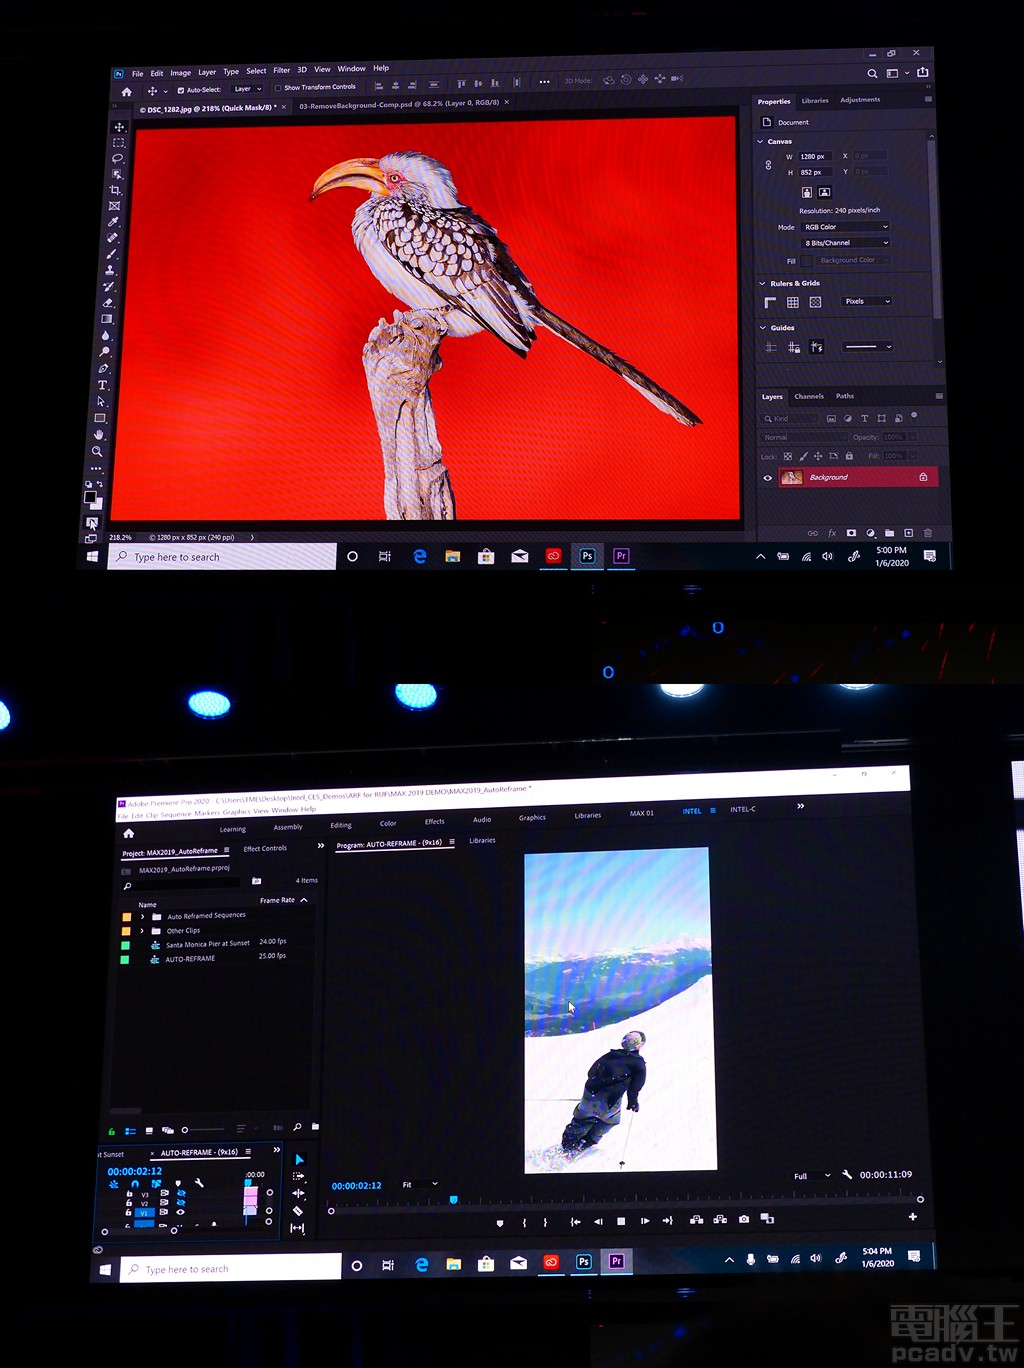 Adobe 軟體能夠有效利用 Intel 處理器加速功能,原廠專業講師 Jason Levine 於現場示範透過 Intel 處理器特性,Photoshop 能夠快速選取主體邊緣羽毛不規則狀而難以去背的鳥類,或是 Premiere Pro 分析影片內容,在變更影片畫面比例的同時,自動將主角自動置於畫面中央。